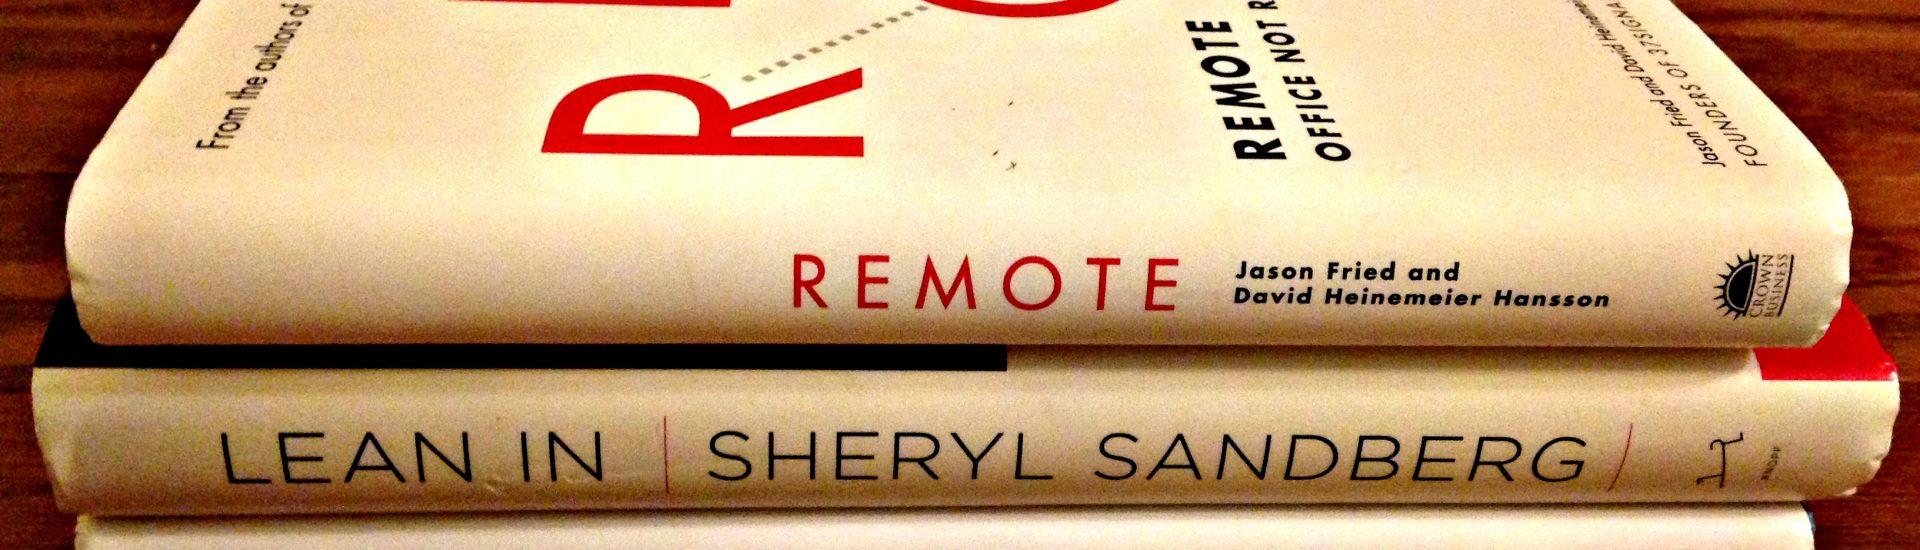 Remote Work Lean In Google books